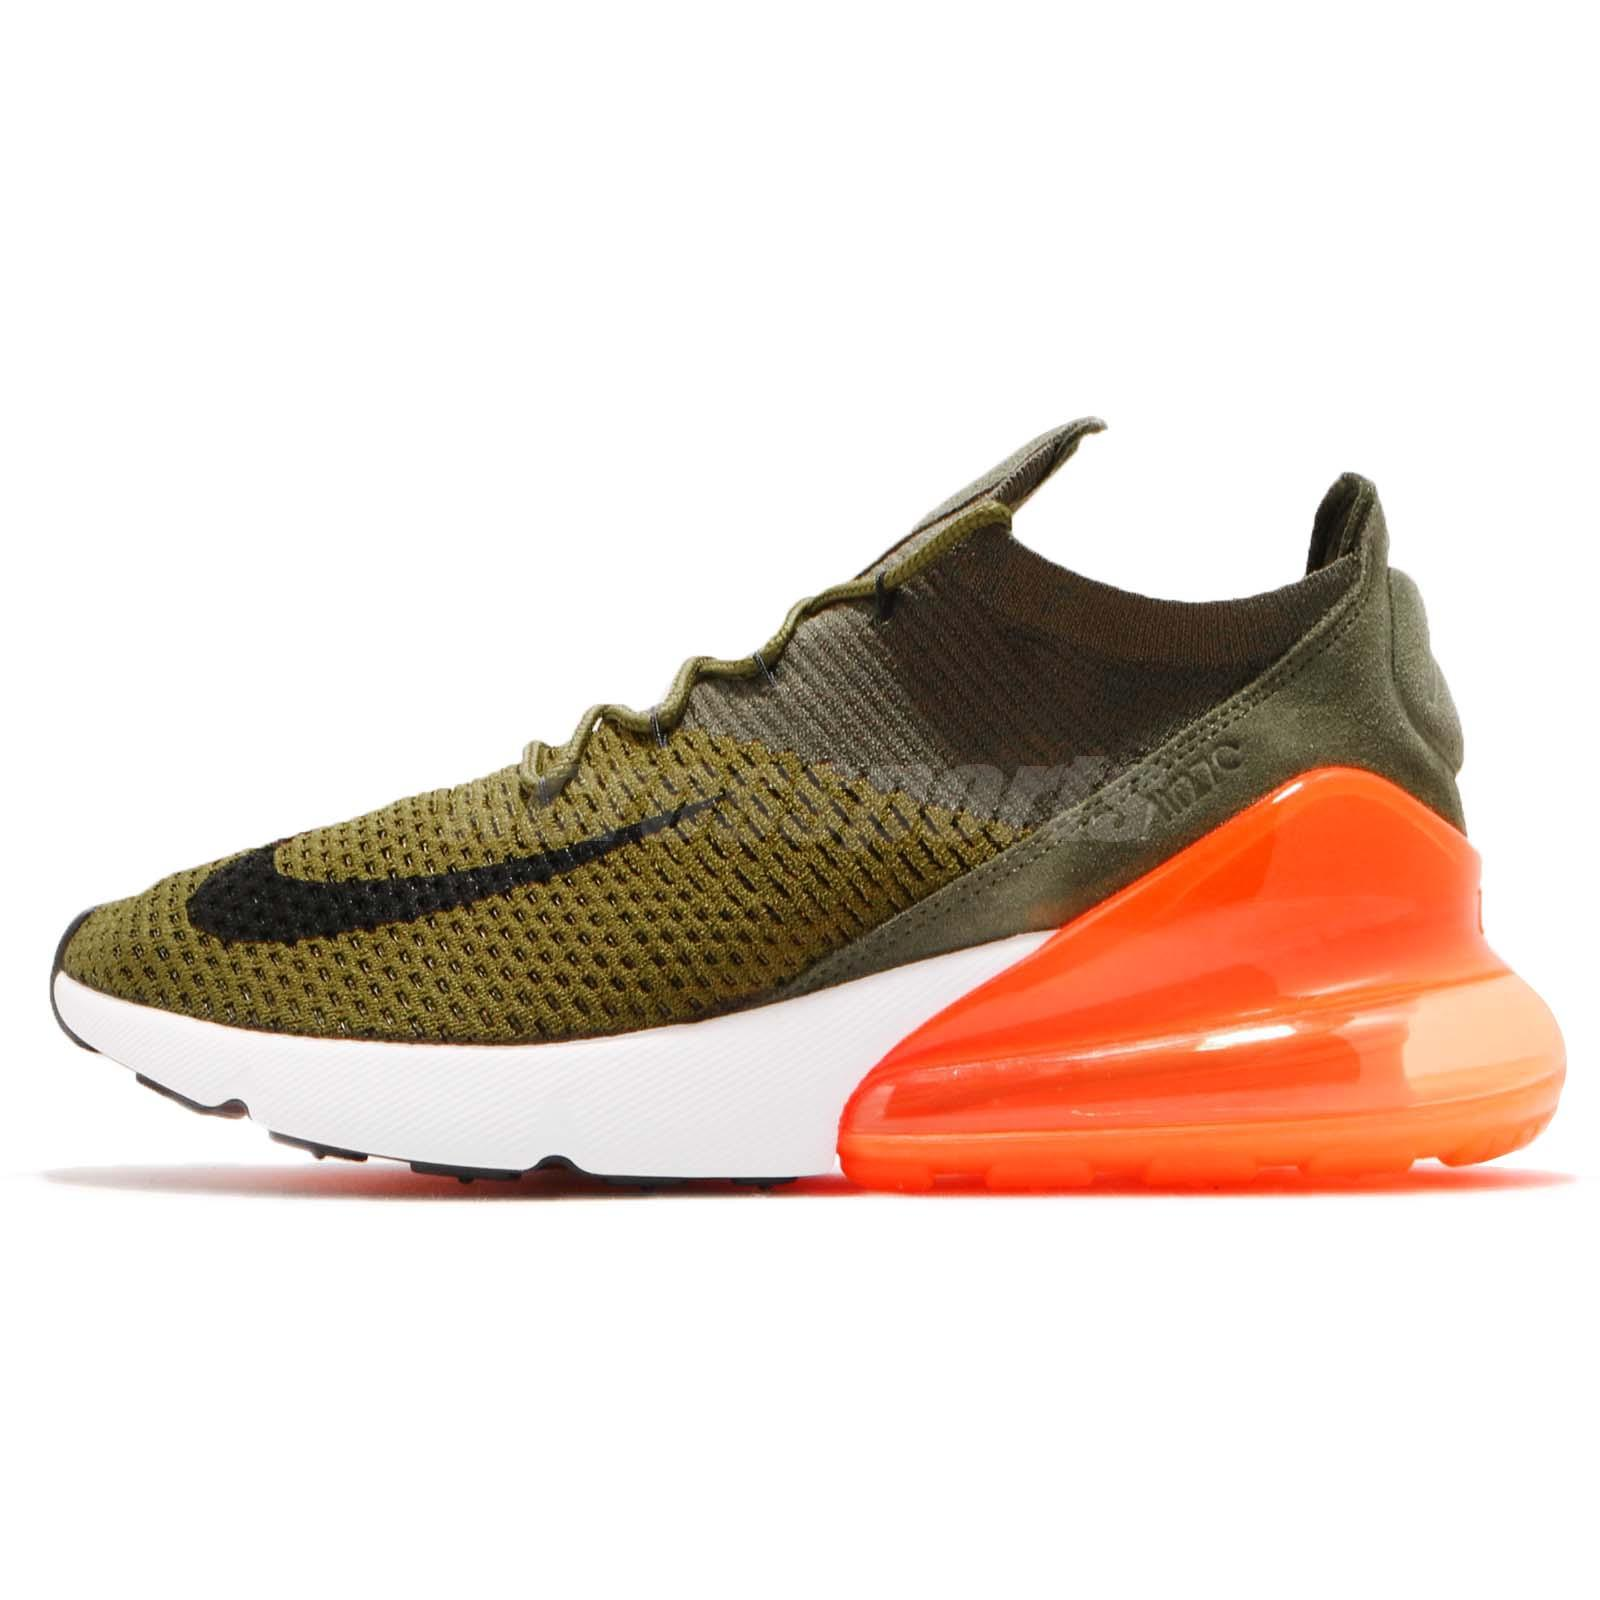 Details about Nike Air Max 270 Flyknit Olive Flak Cargo Khaki Orange Men Shoes AO1023 301